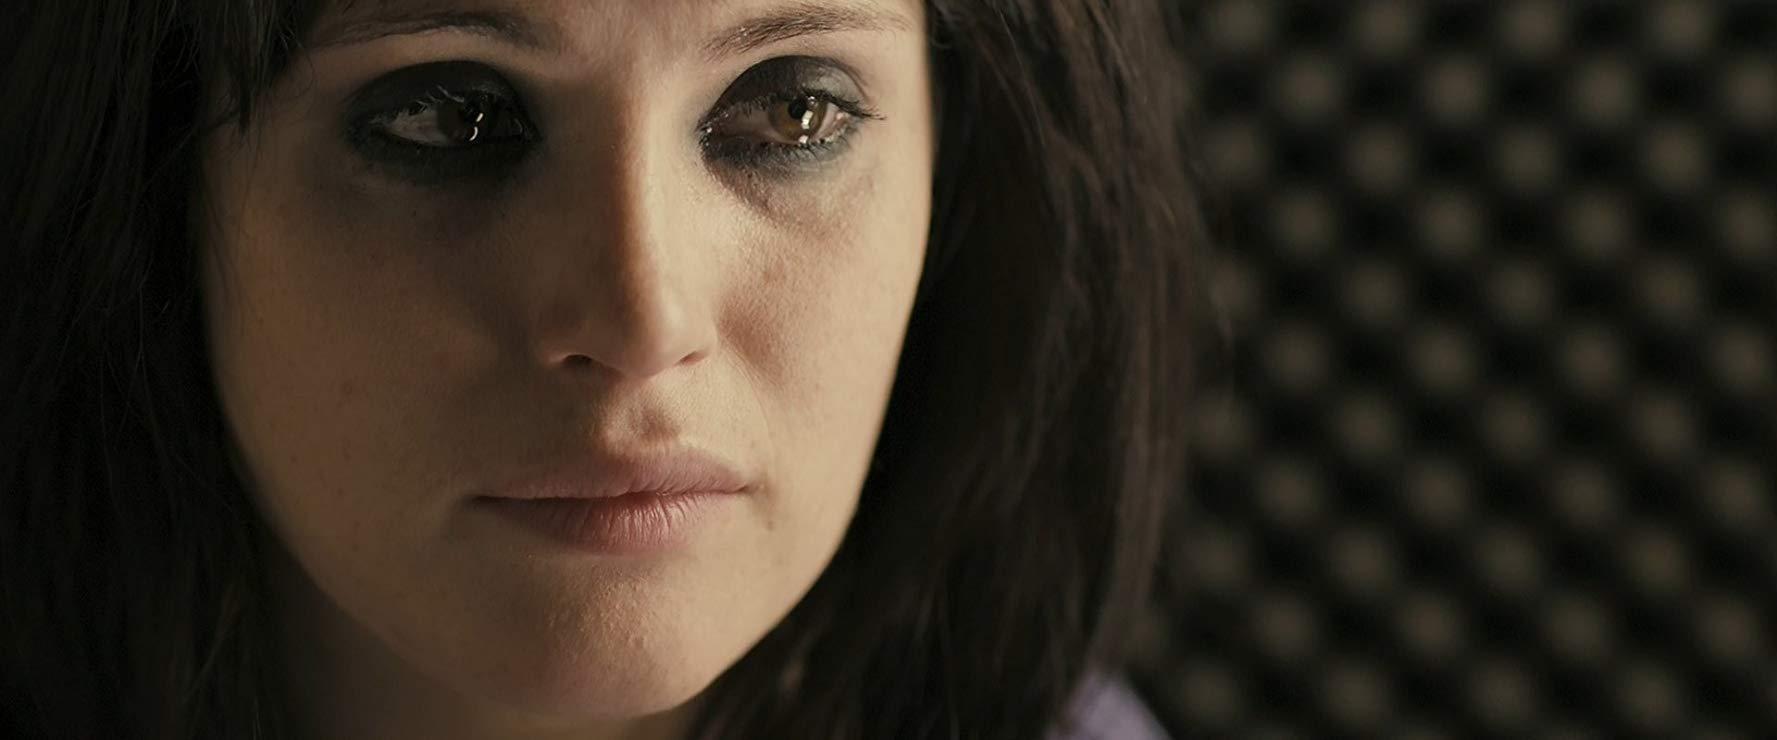 مشاهدة فيلم The Disappearance Of Alice Creed 2009 HD مترجم كامل اون لاين